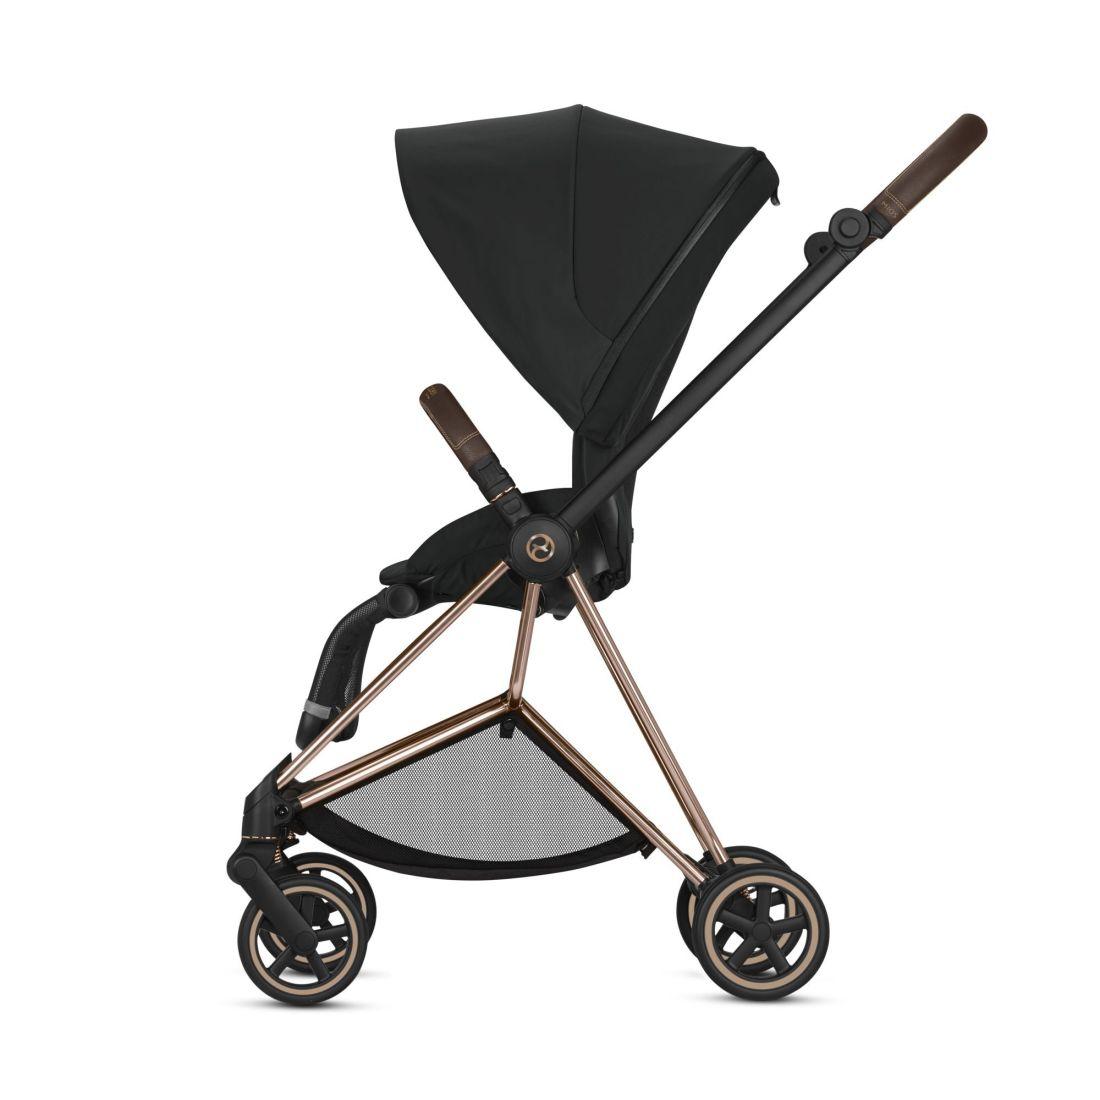 CYBEX MIOS Stroller - REVERSIBLE SEAT UNIT